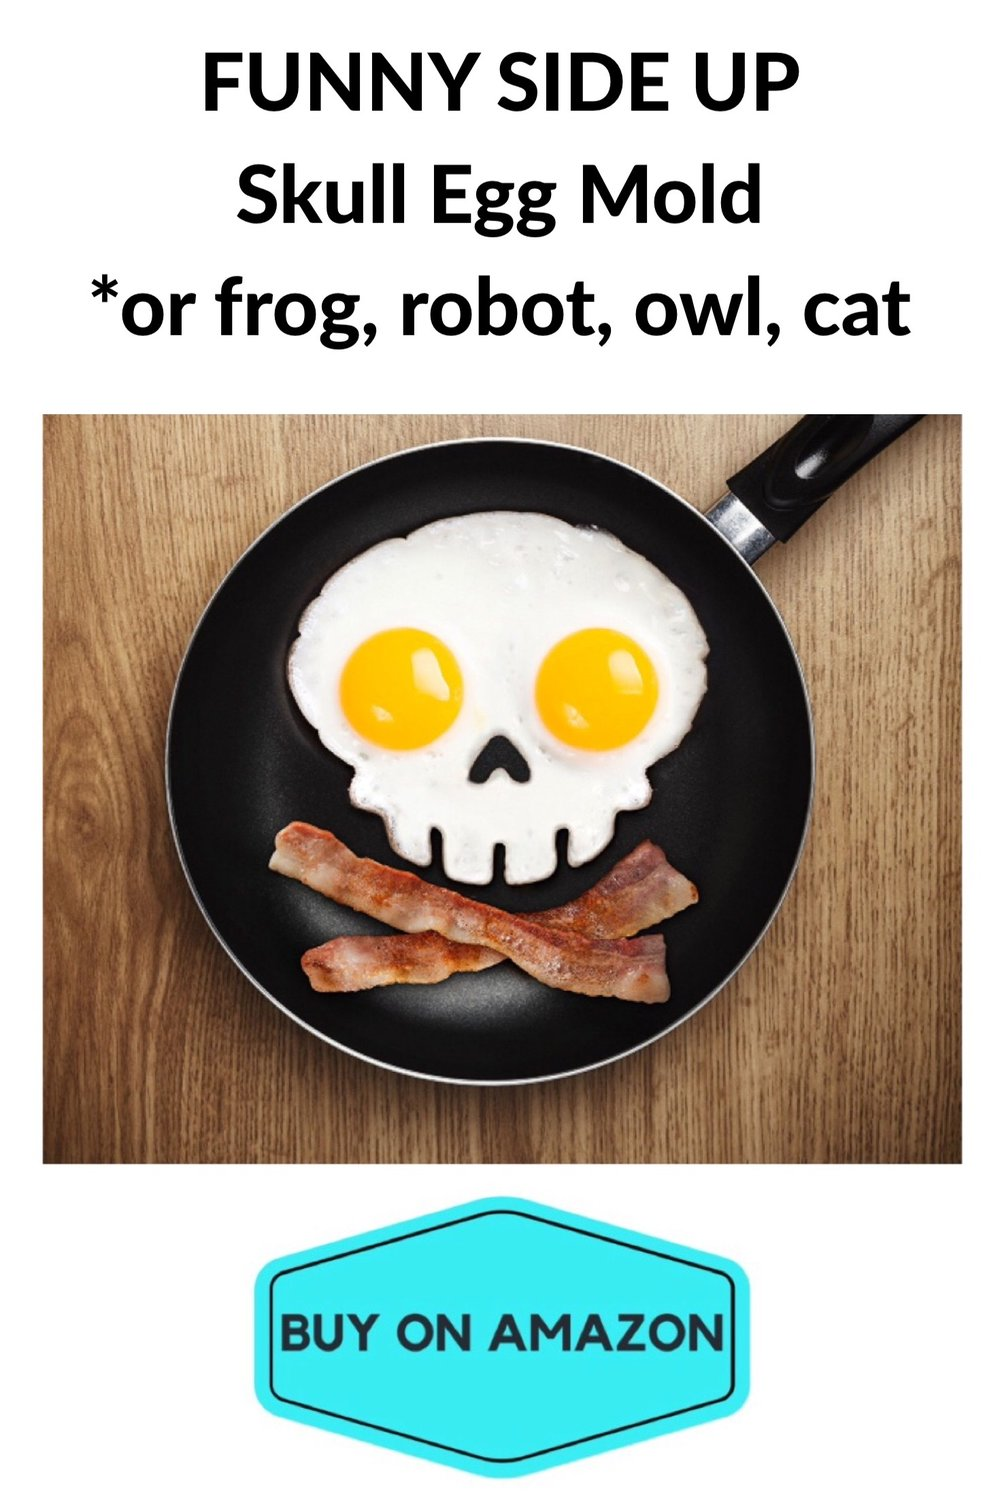 FUNNY SIDE UP Skull Egg Mold